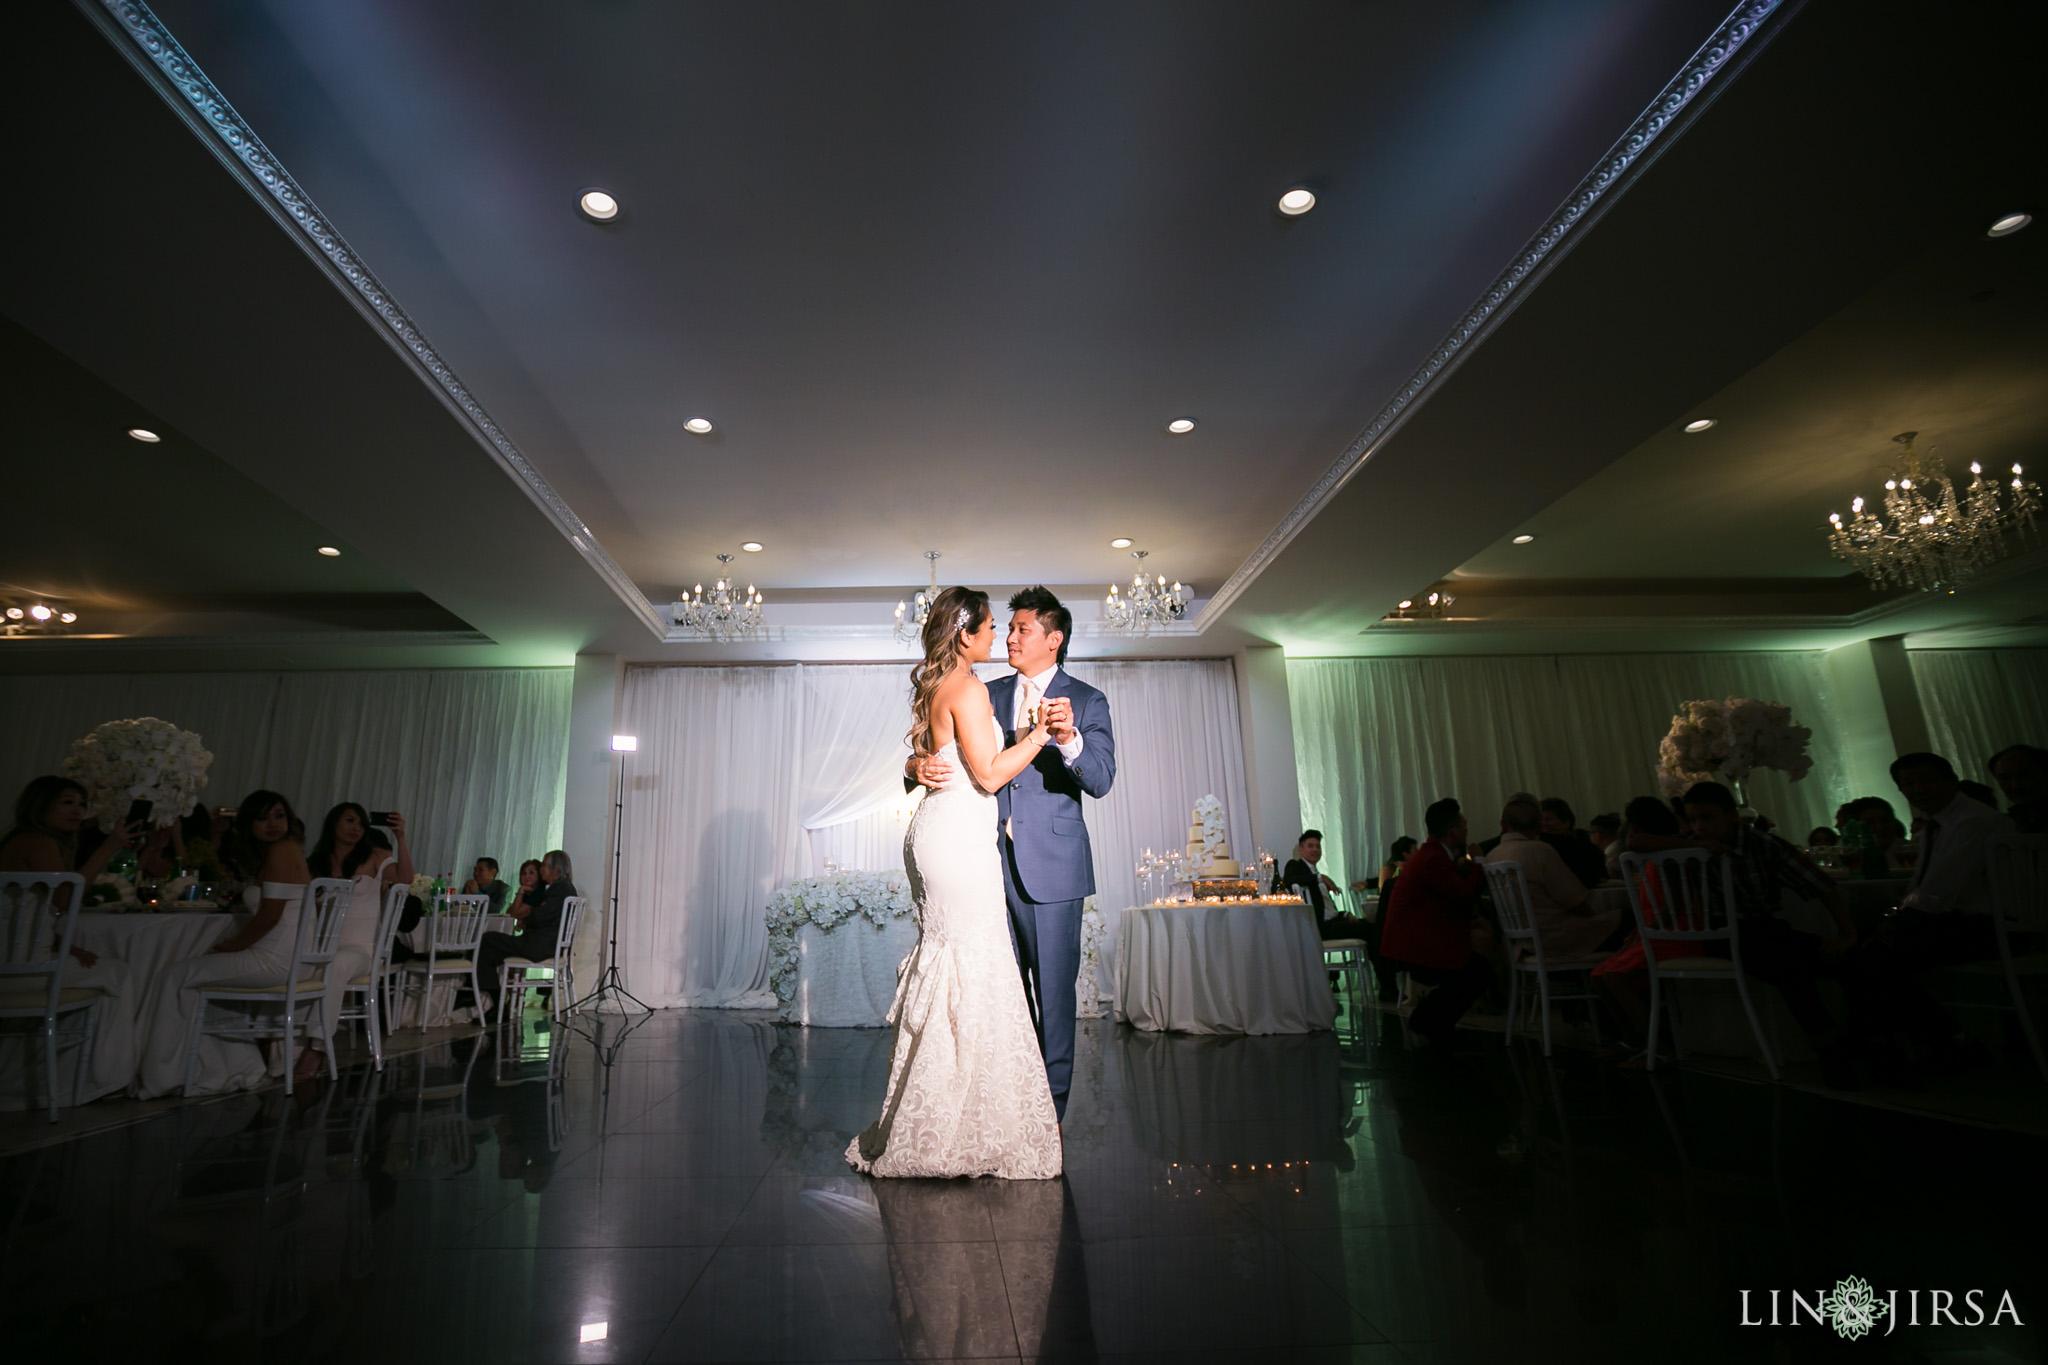 mon cheri wedding lin and jirsa photography